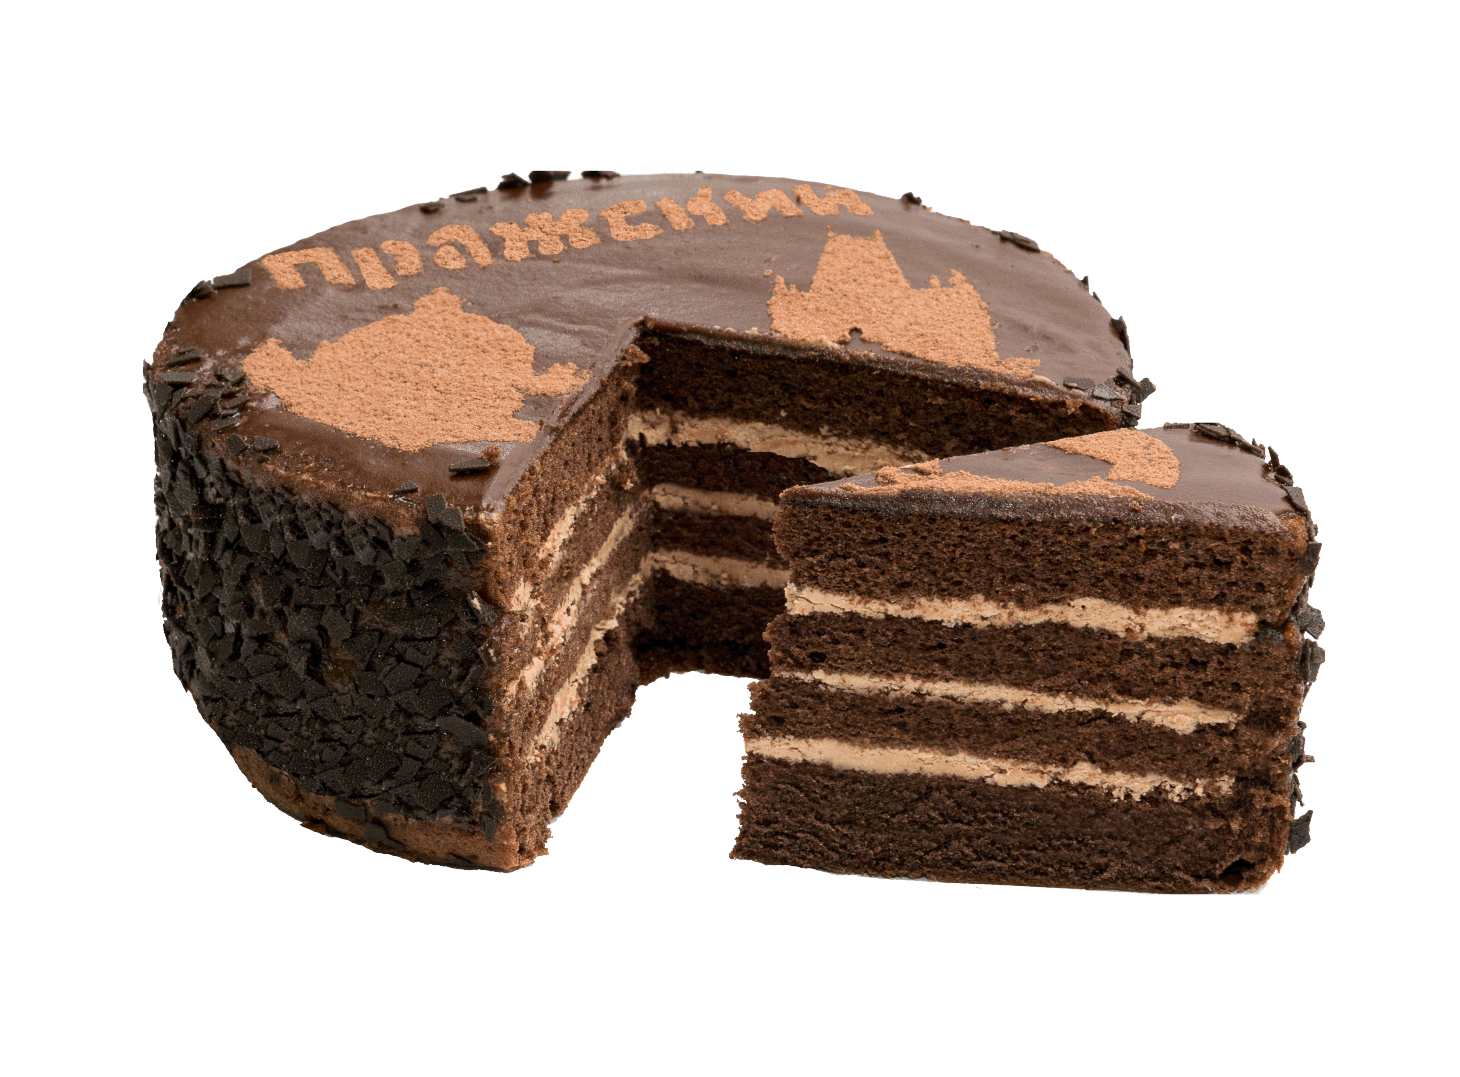 https://pngimg.com/uploads/chocolate_cake/chocolate_cake_PNG38.png Chocolate